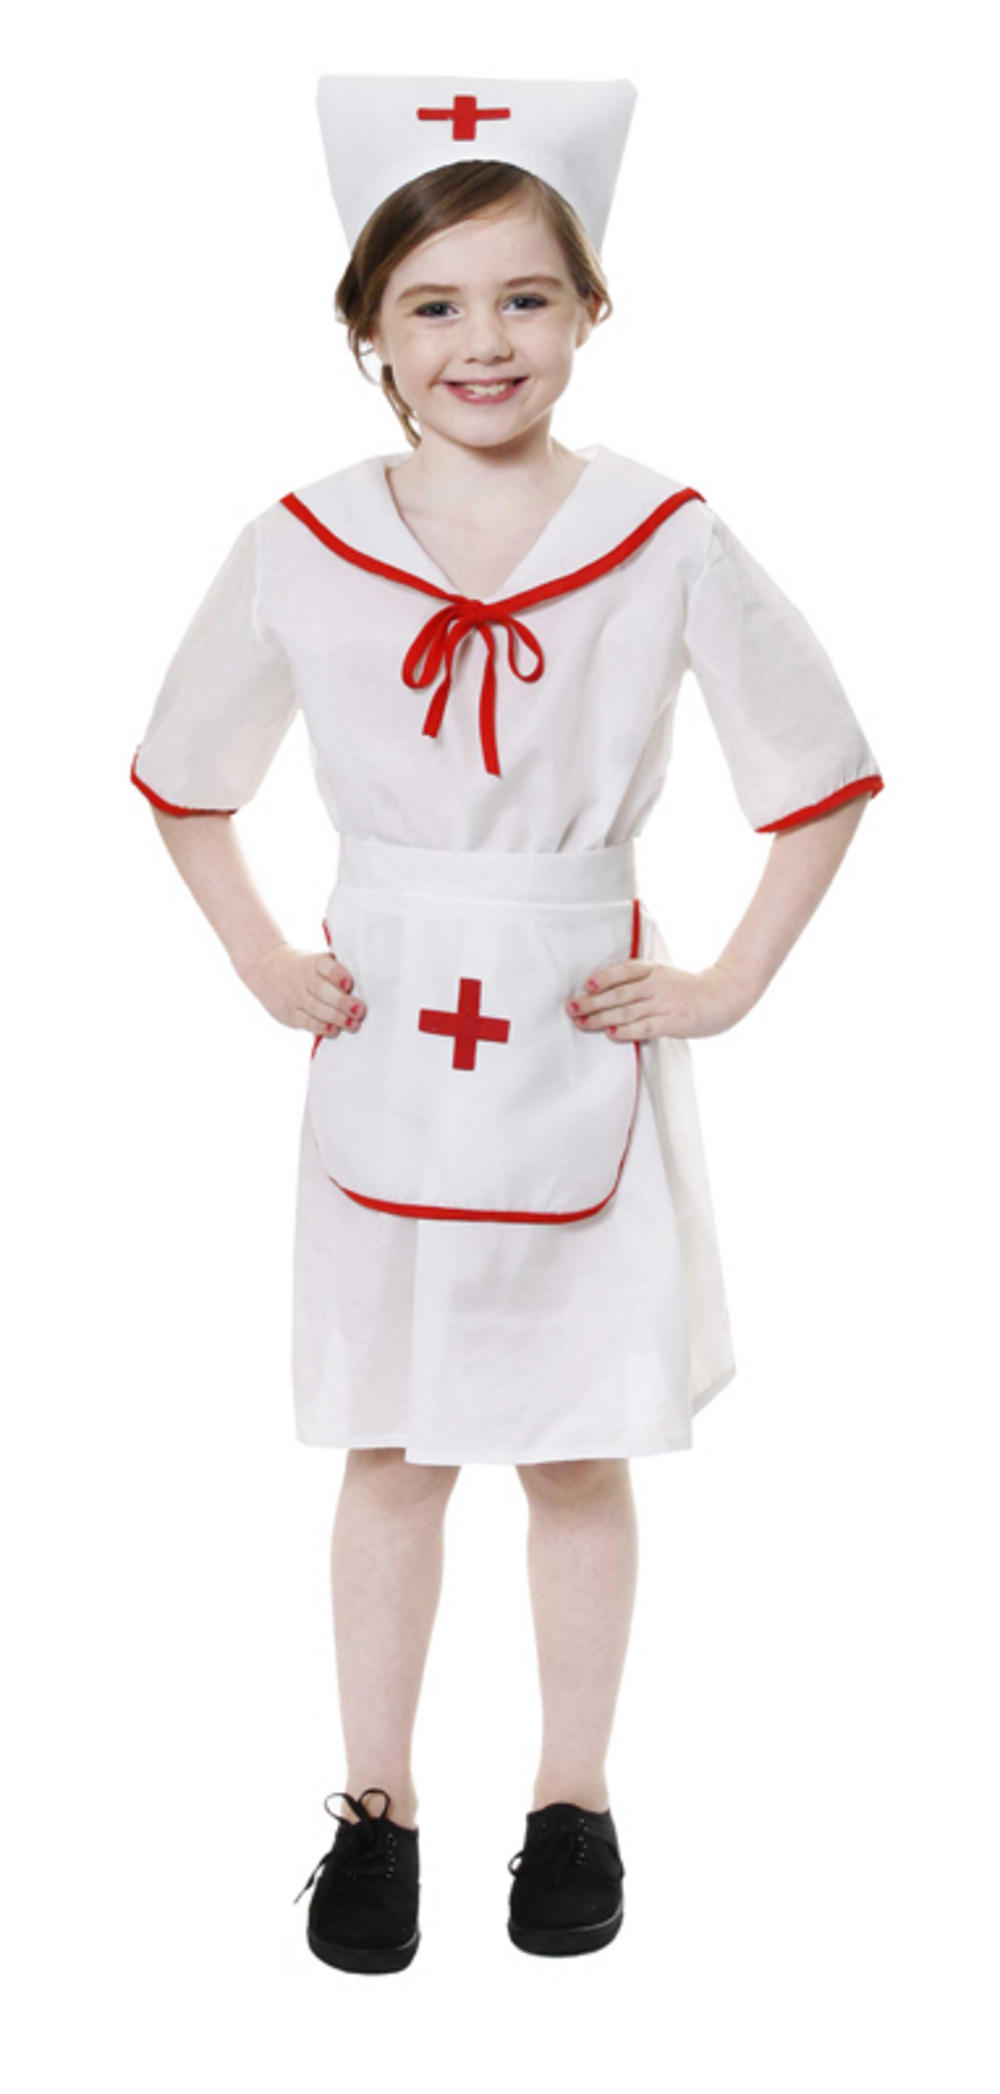 b35fceab7ff0f Girl's Toddler Nurse Costume | Girl's World Book Day Fancy Dress Costumes |  Mega Fancy Dress